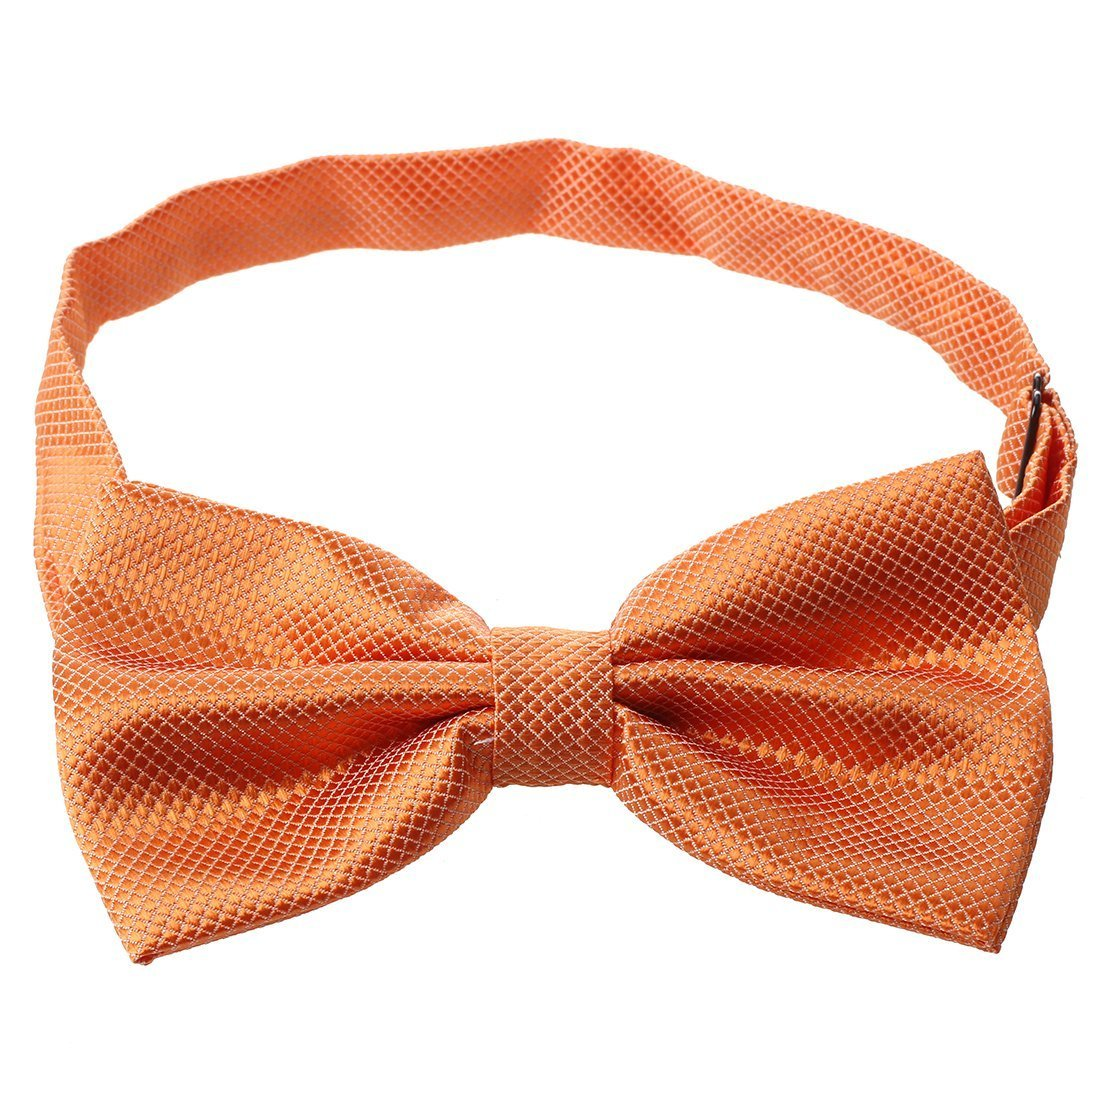 SODIAL(R) Corbata de Lazo Pajarita Bow Tie para Traje Formal ...